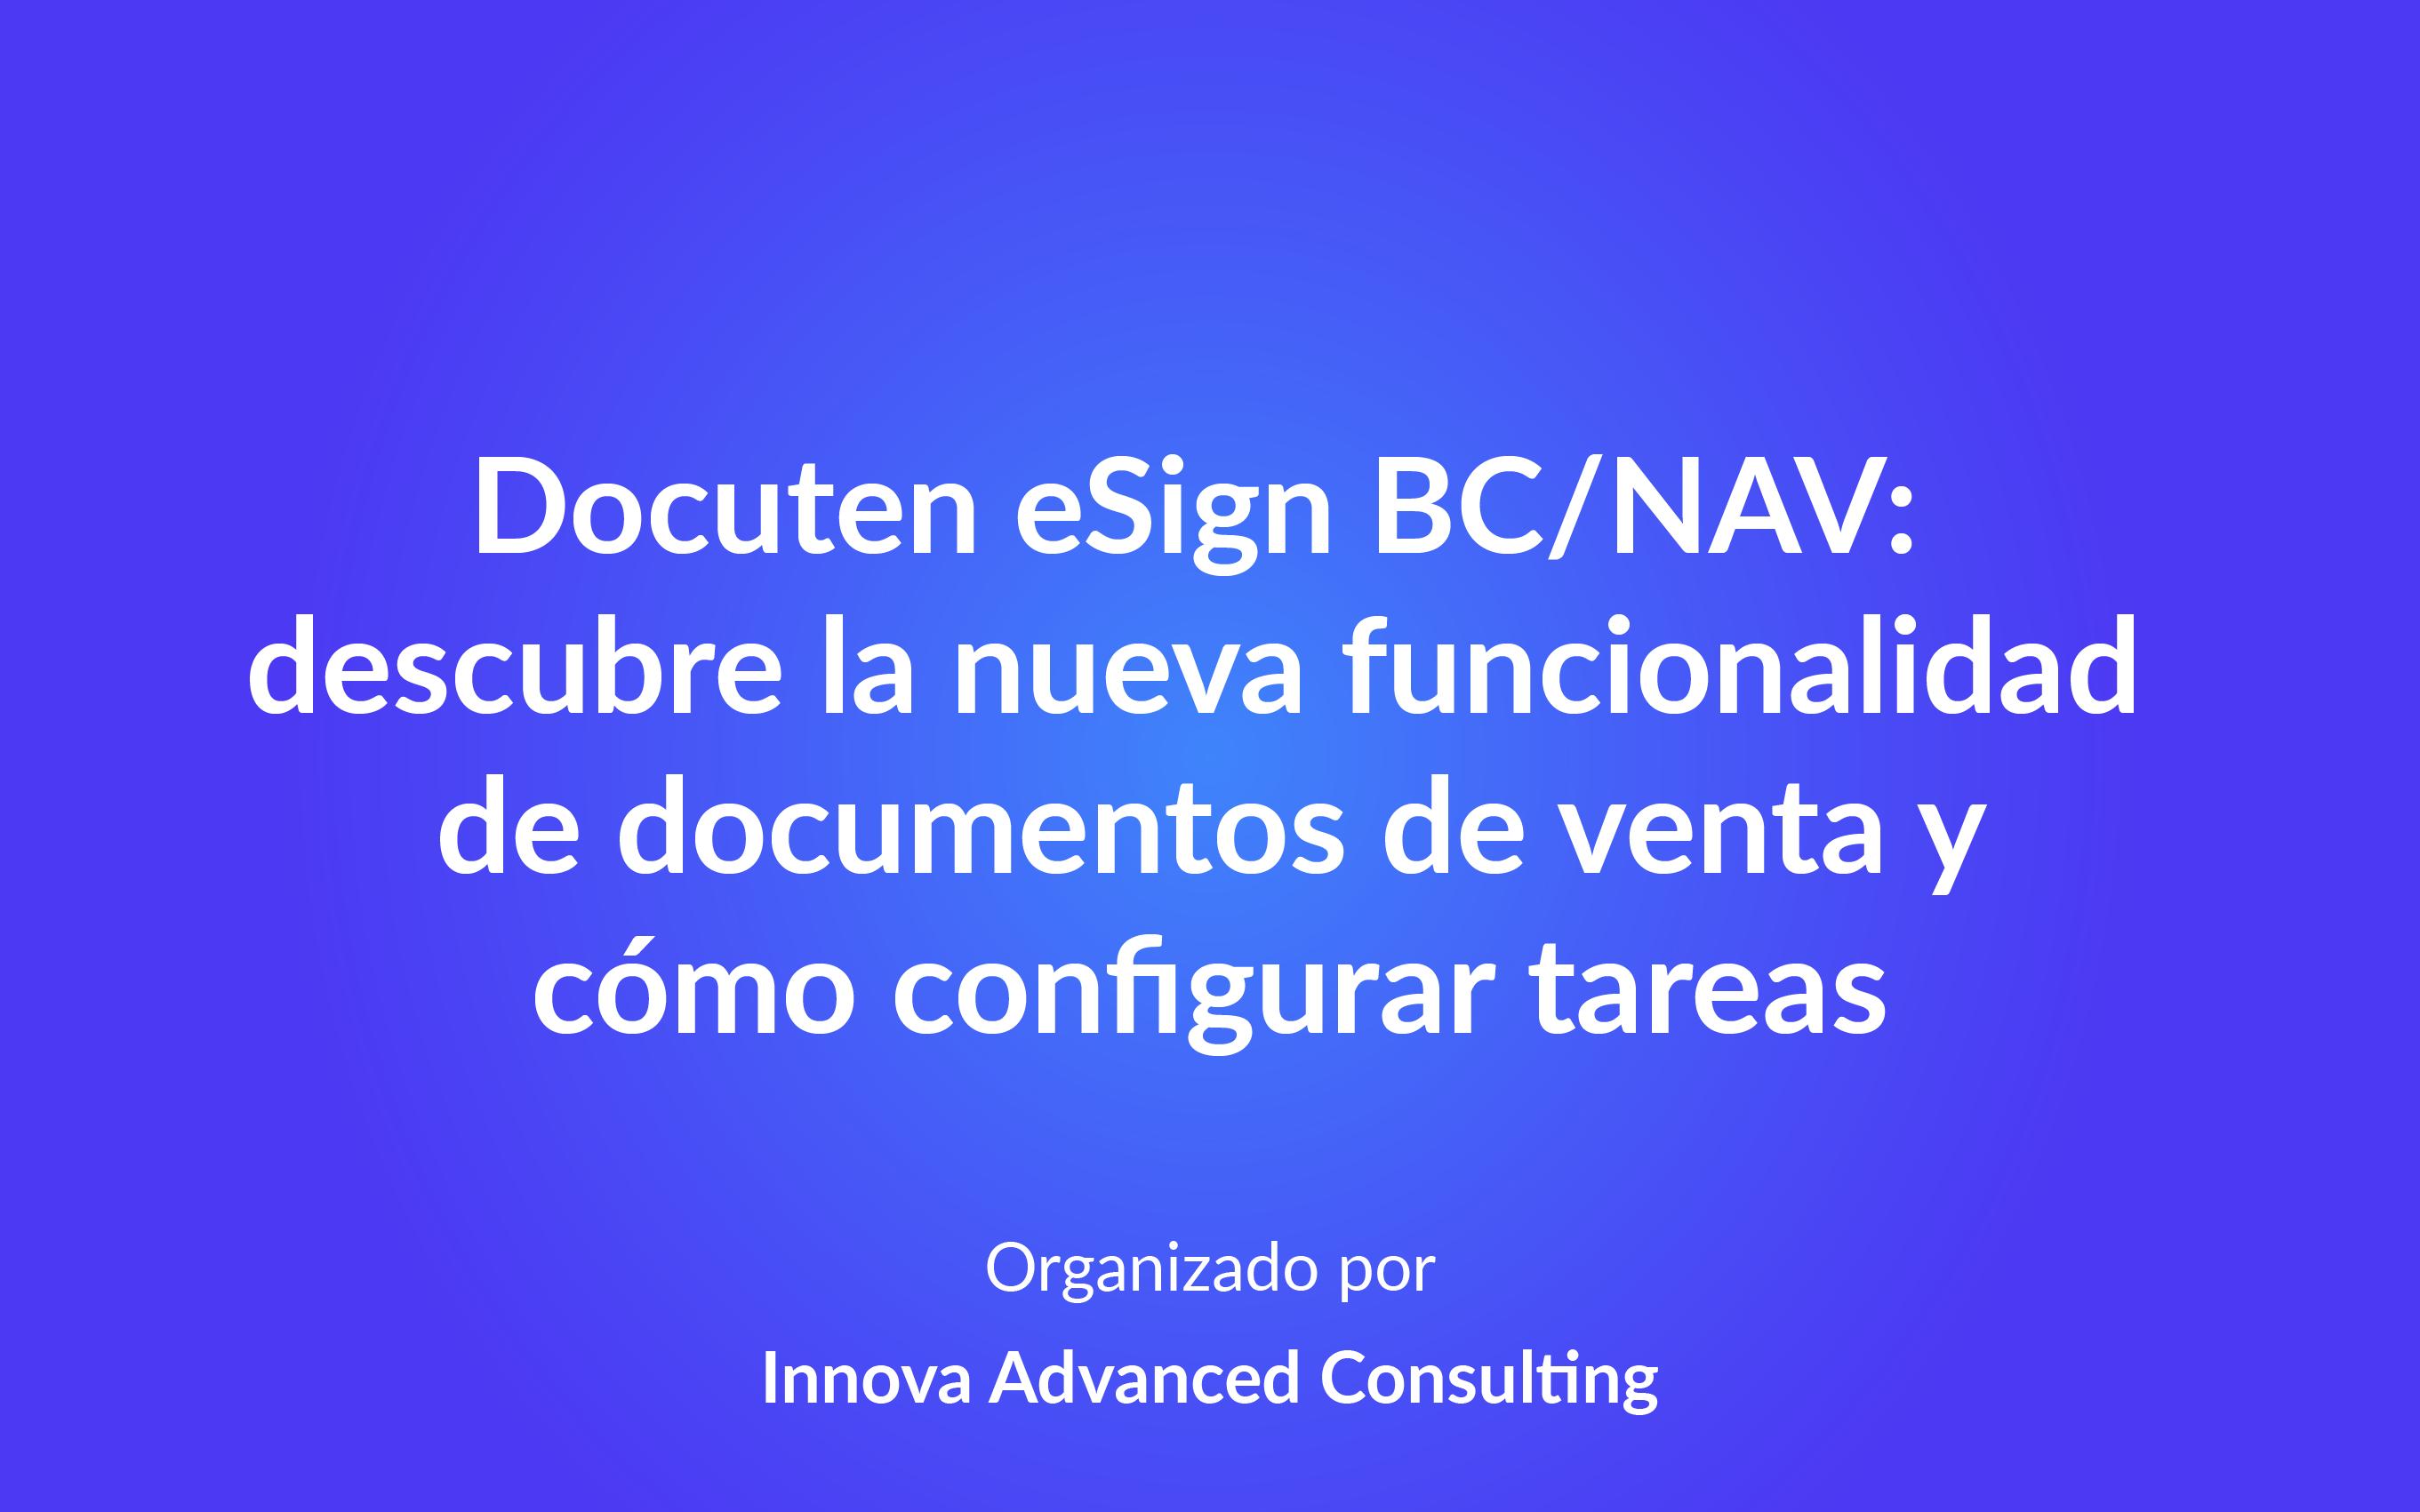 Docuten eSign BC/NAV